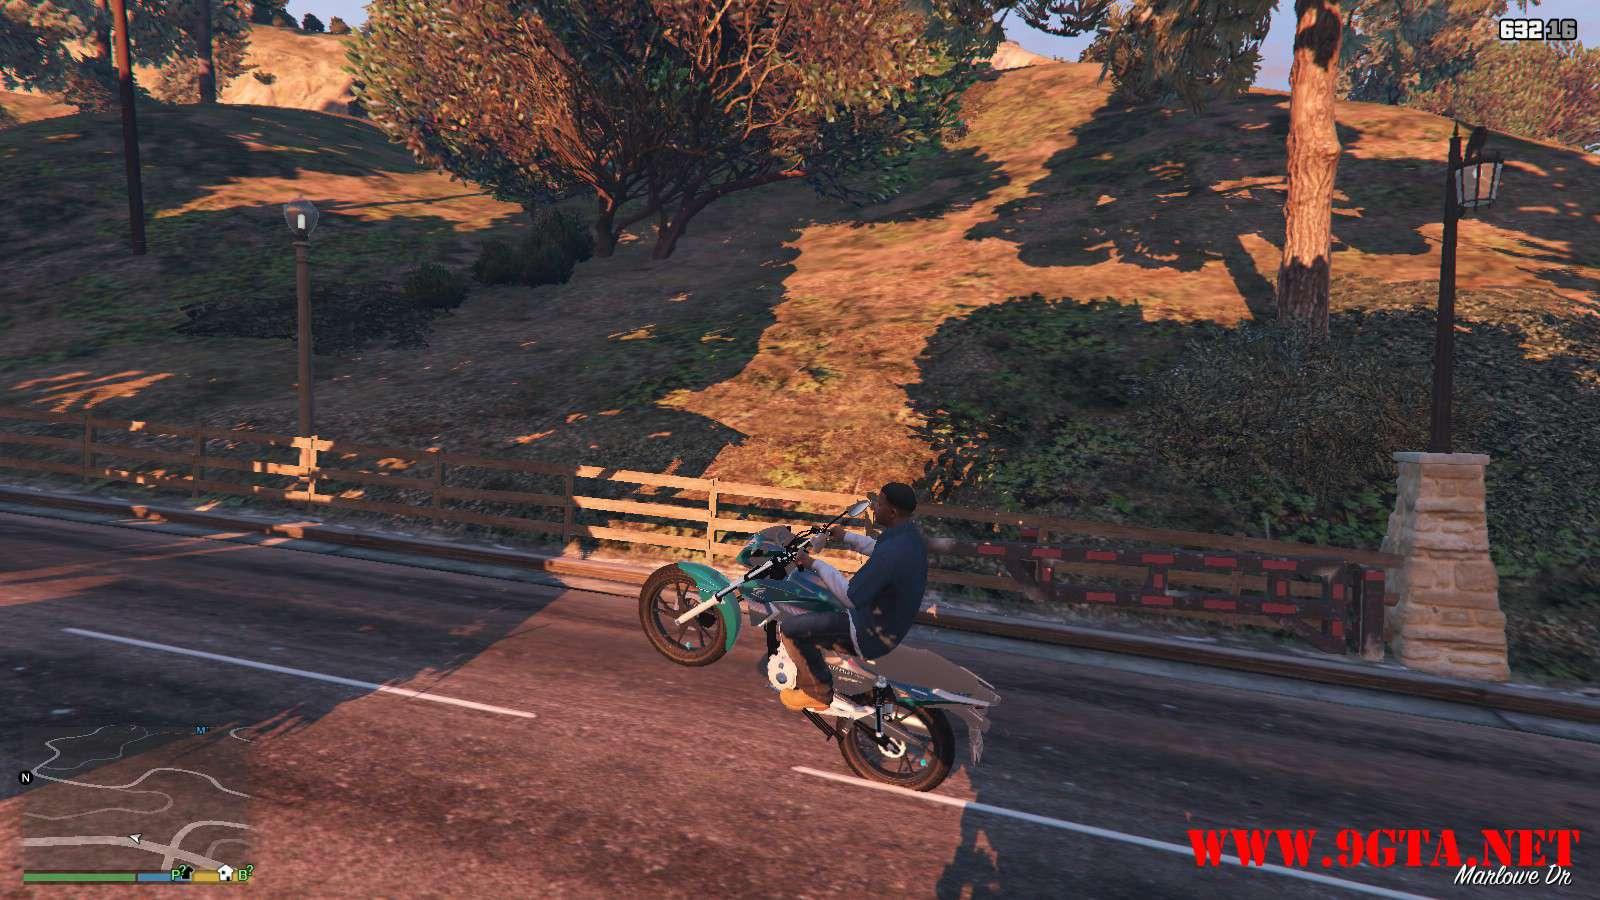 2016 Titan 160 Motocycle GTA5 Mods (14)